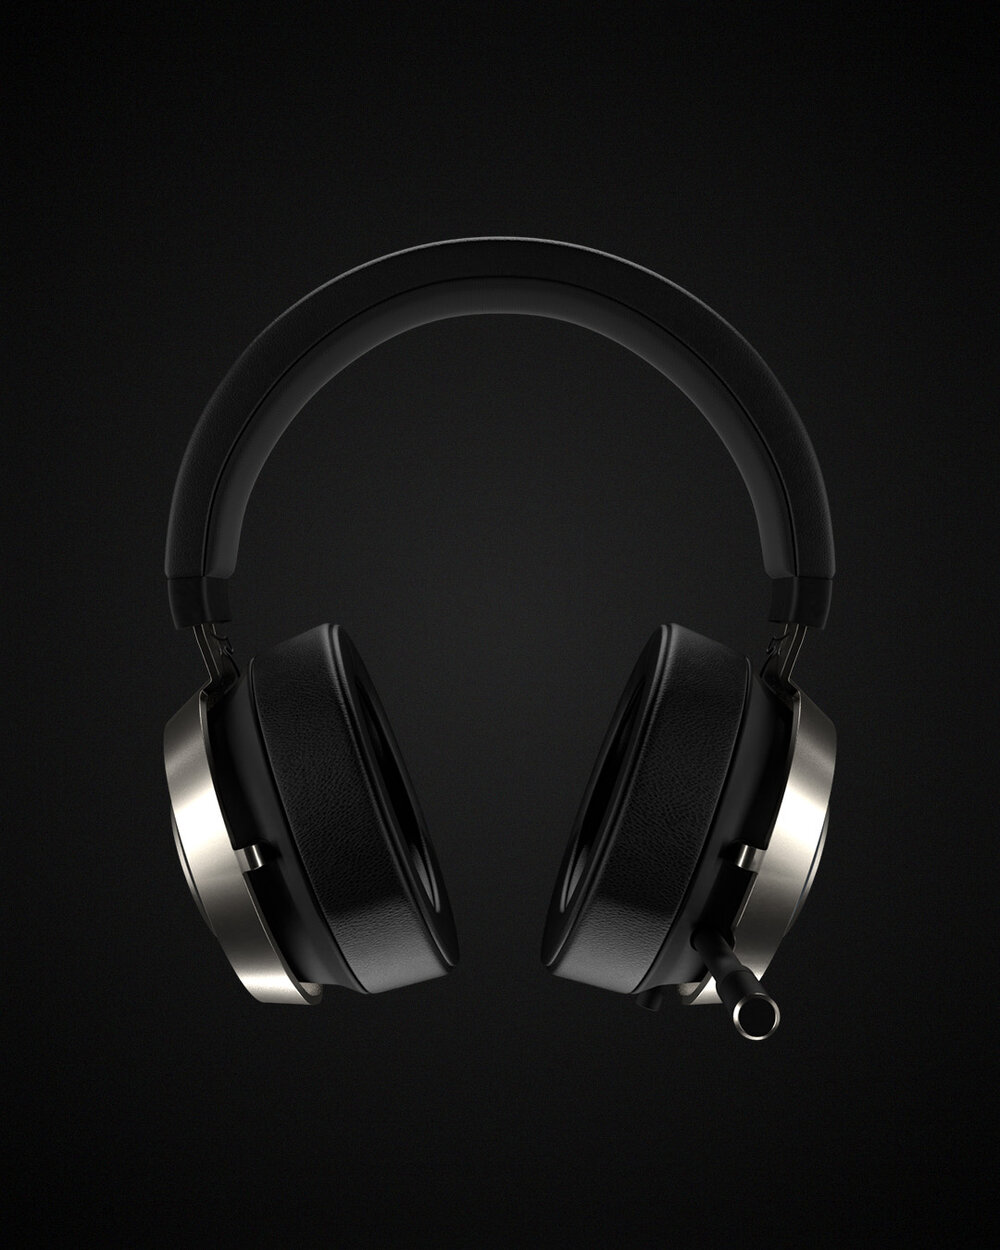 Headset_FrontView.jpg